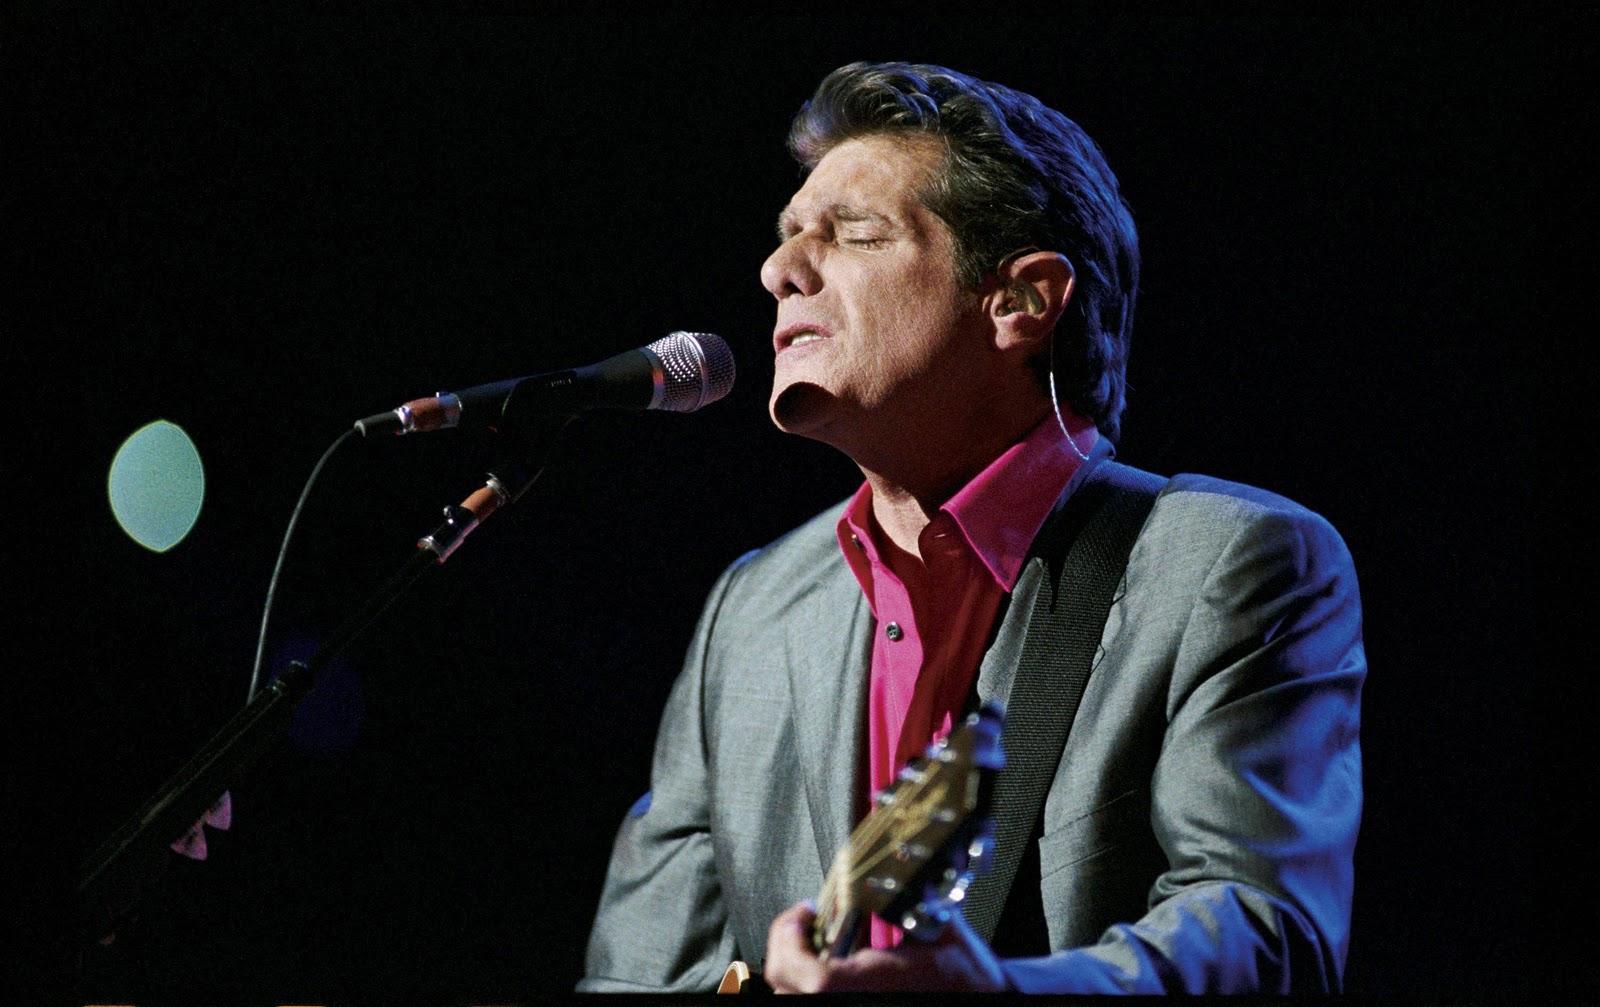 Eagles Guitarist, Glenn Frey dies at 67